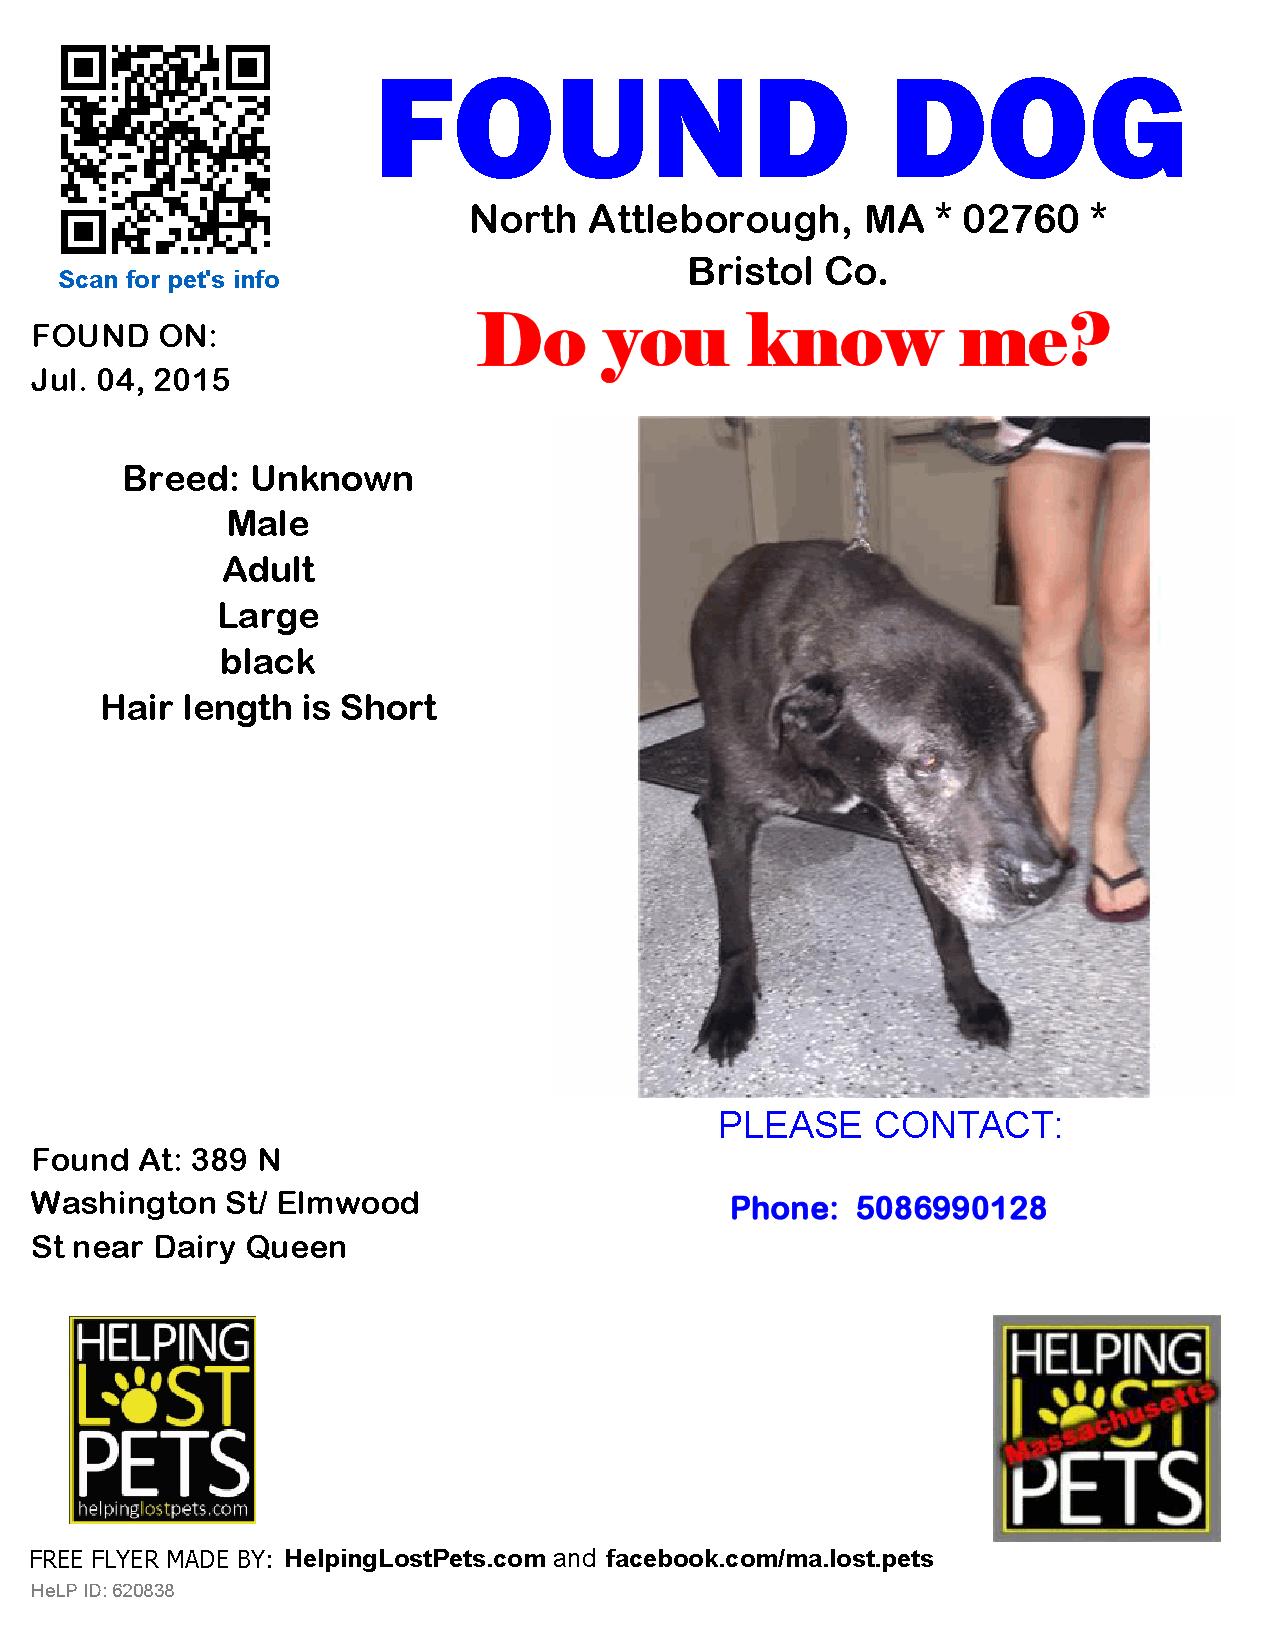 Found Dog Unknown North Attleborough, MA, United